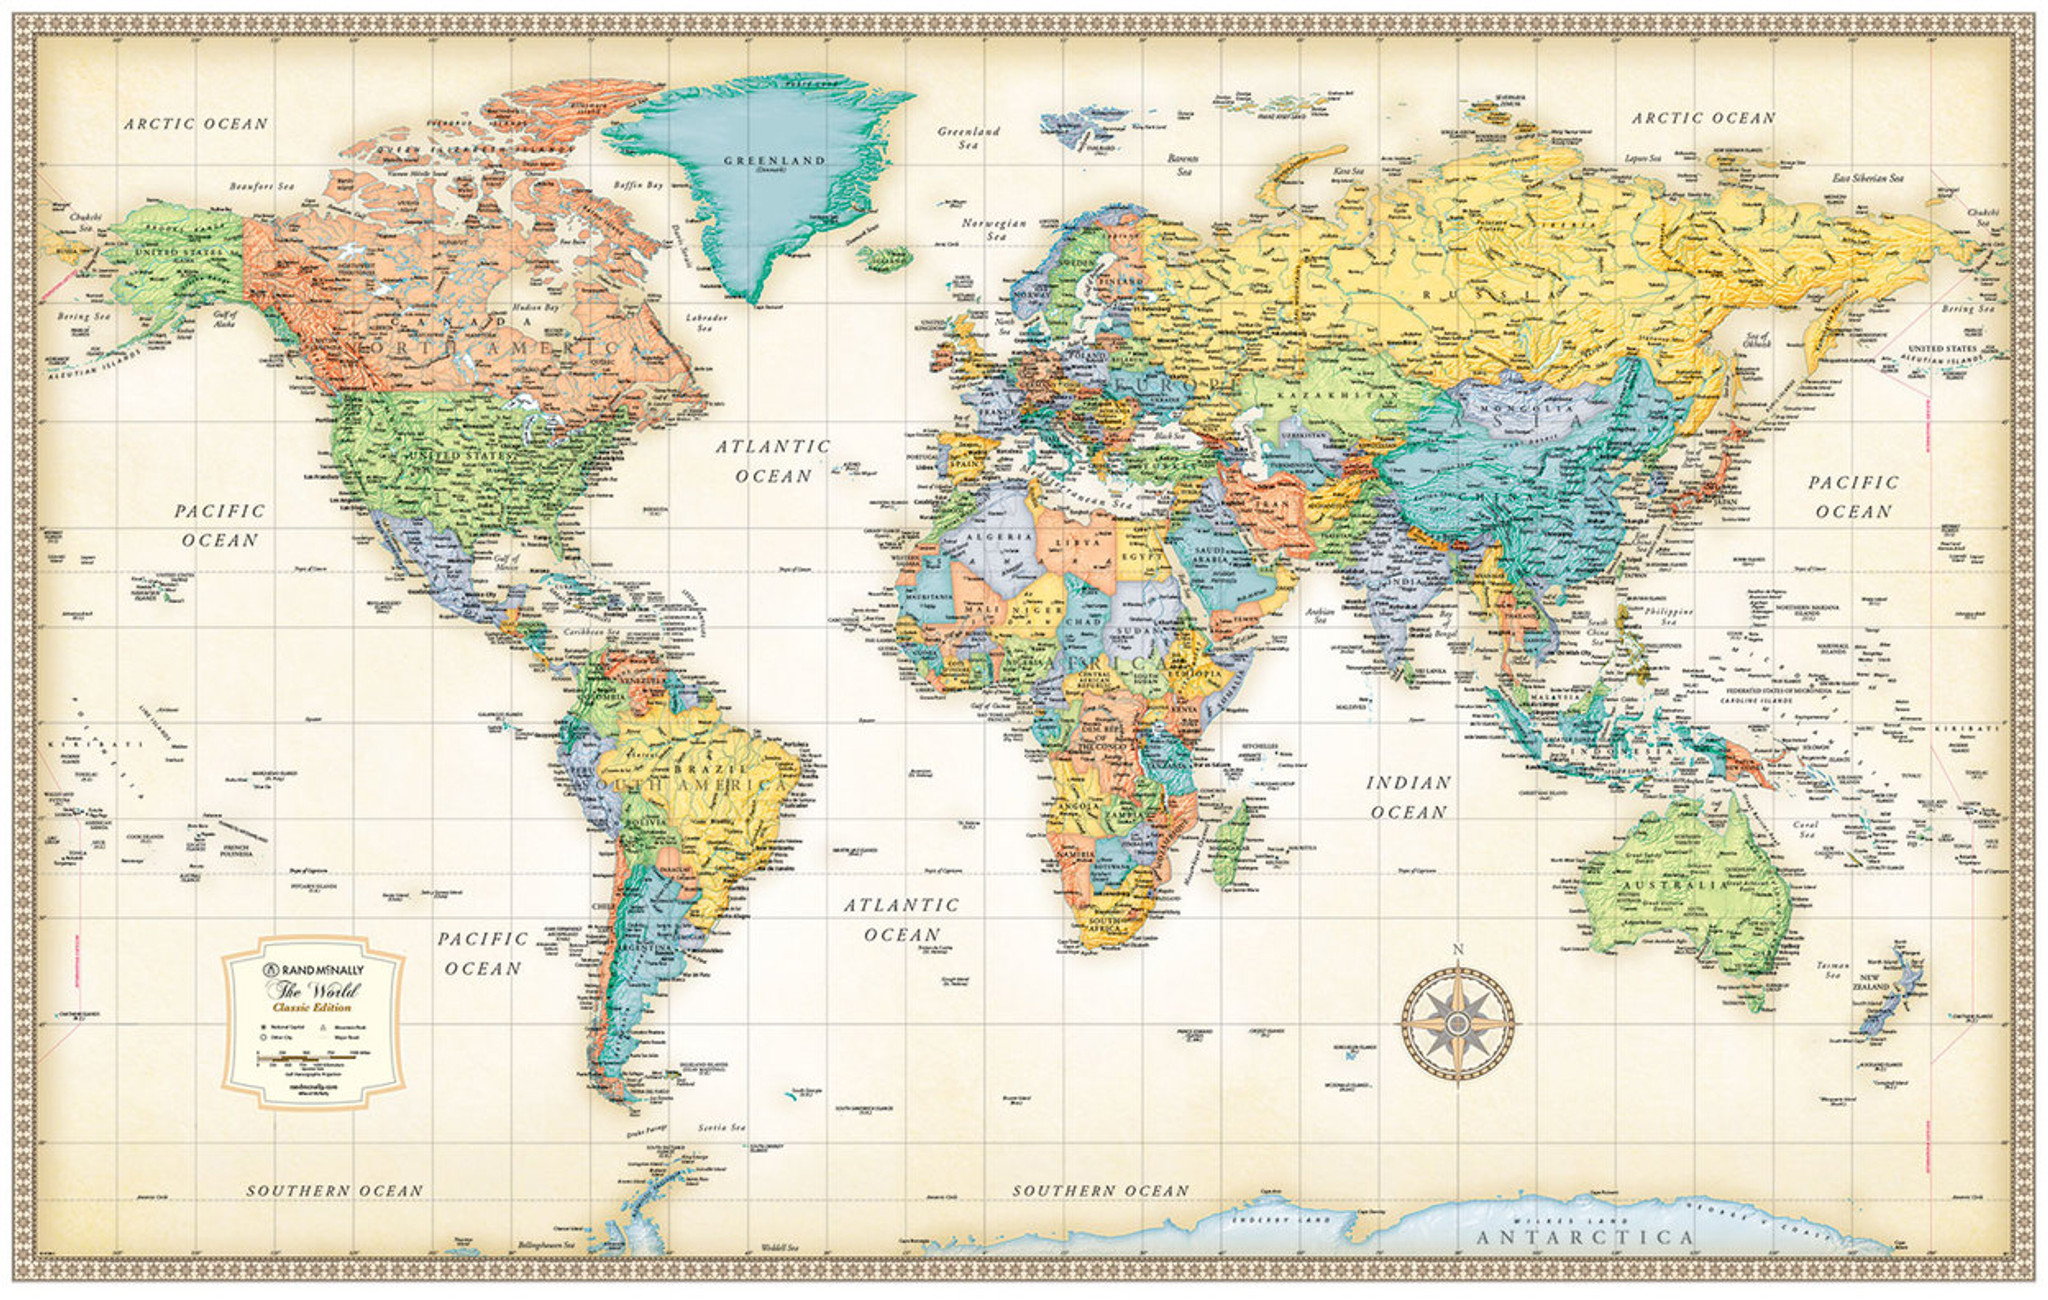 Worksheet. Classic Edition World Wall Maps  Rand McNally Store